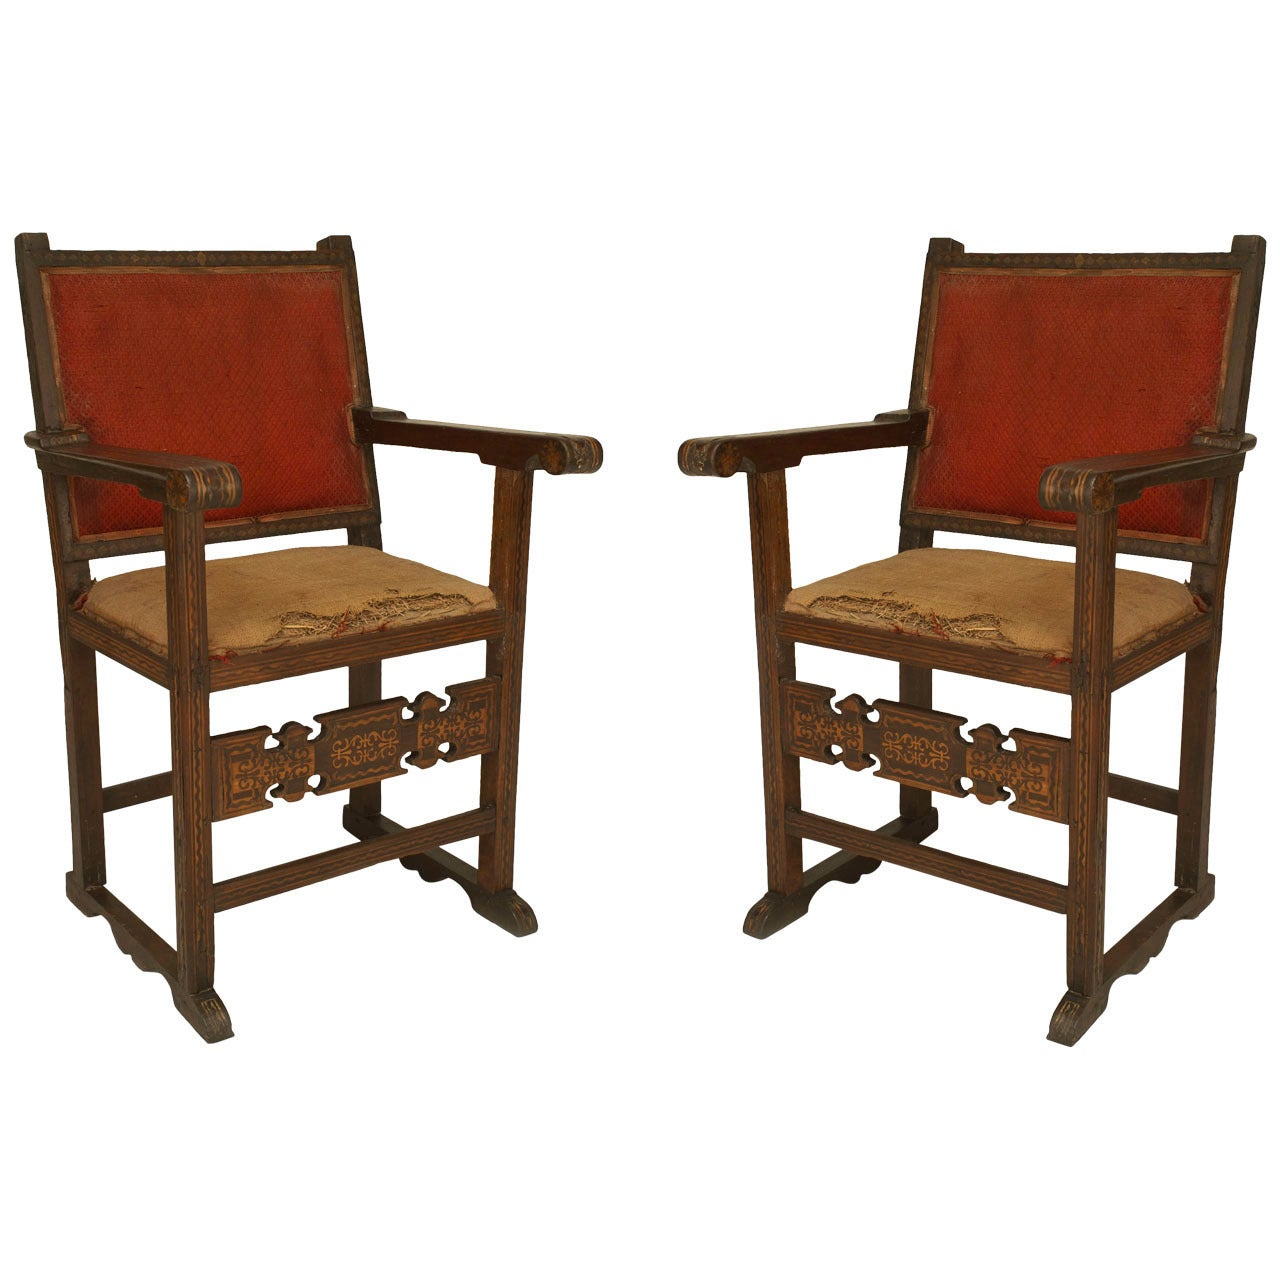 Pair of Spanish Colonial Walnut Armchairs